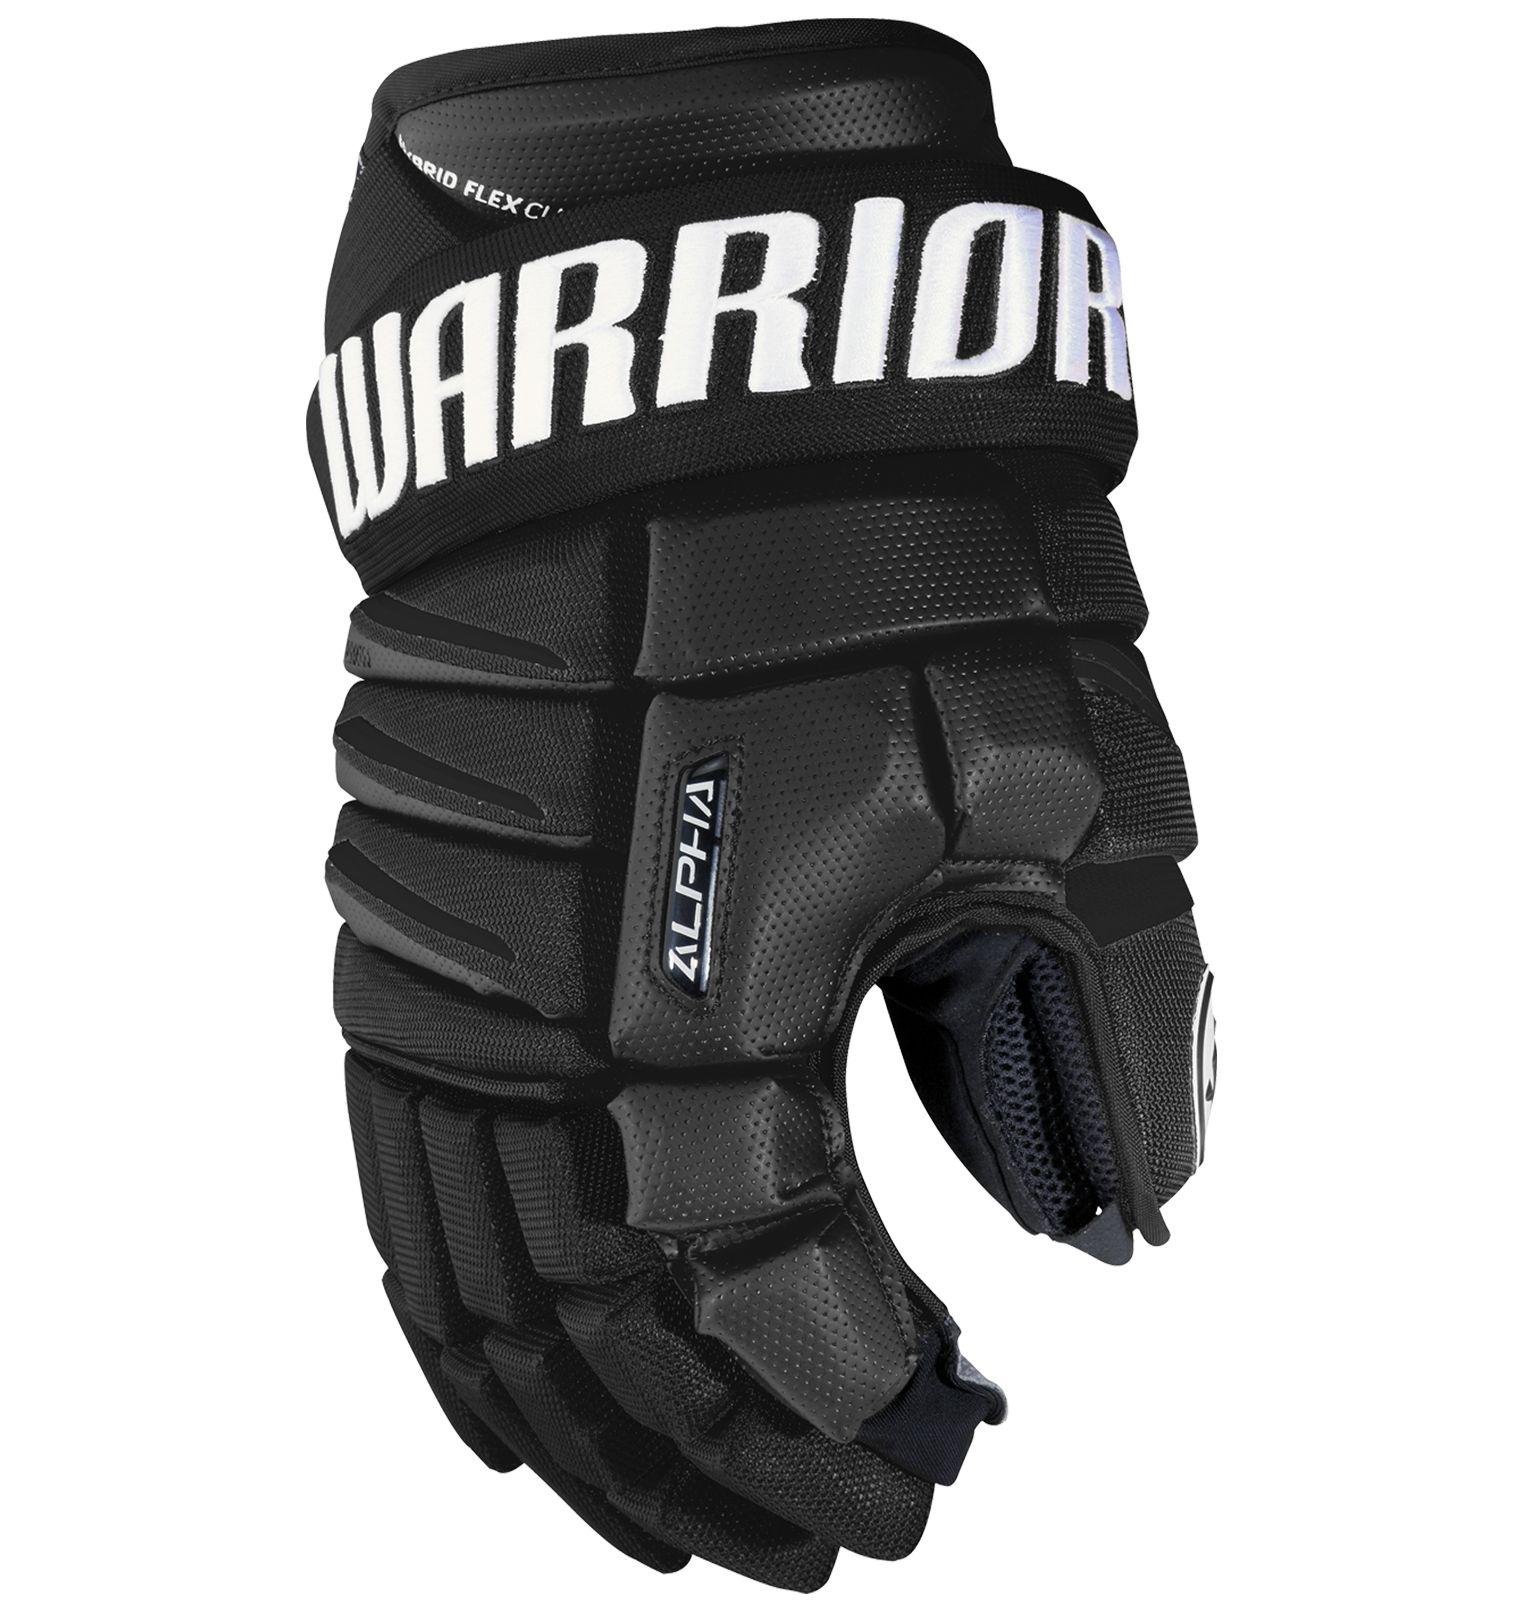 Alpha Qx Sr Glove Black